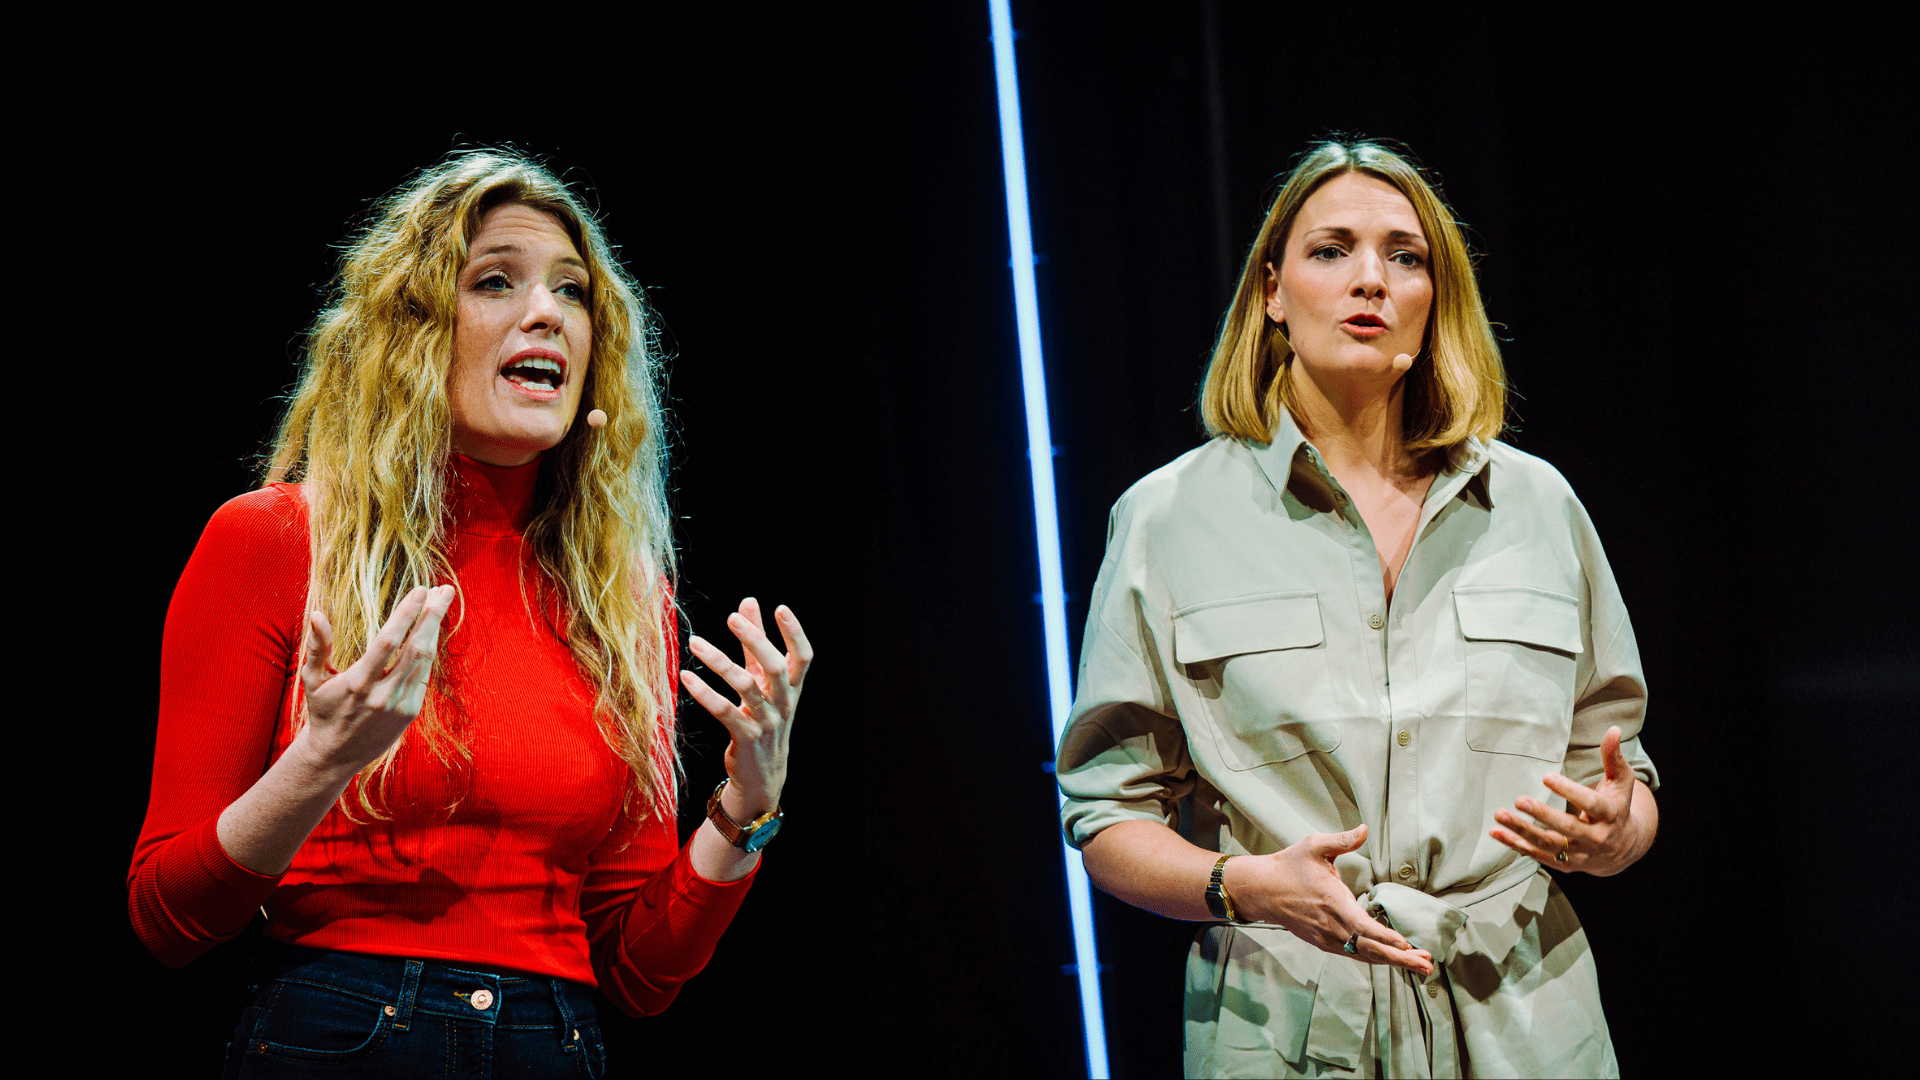 Penny Van Puymbroeck & Ilse Roosens